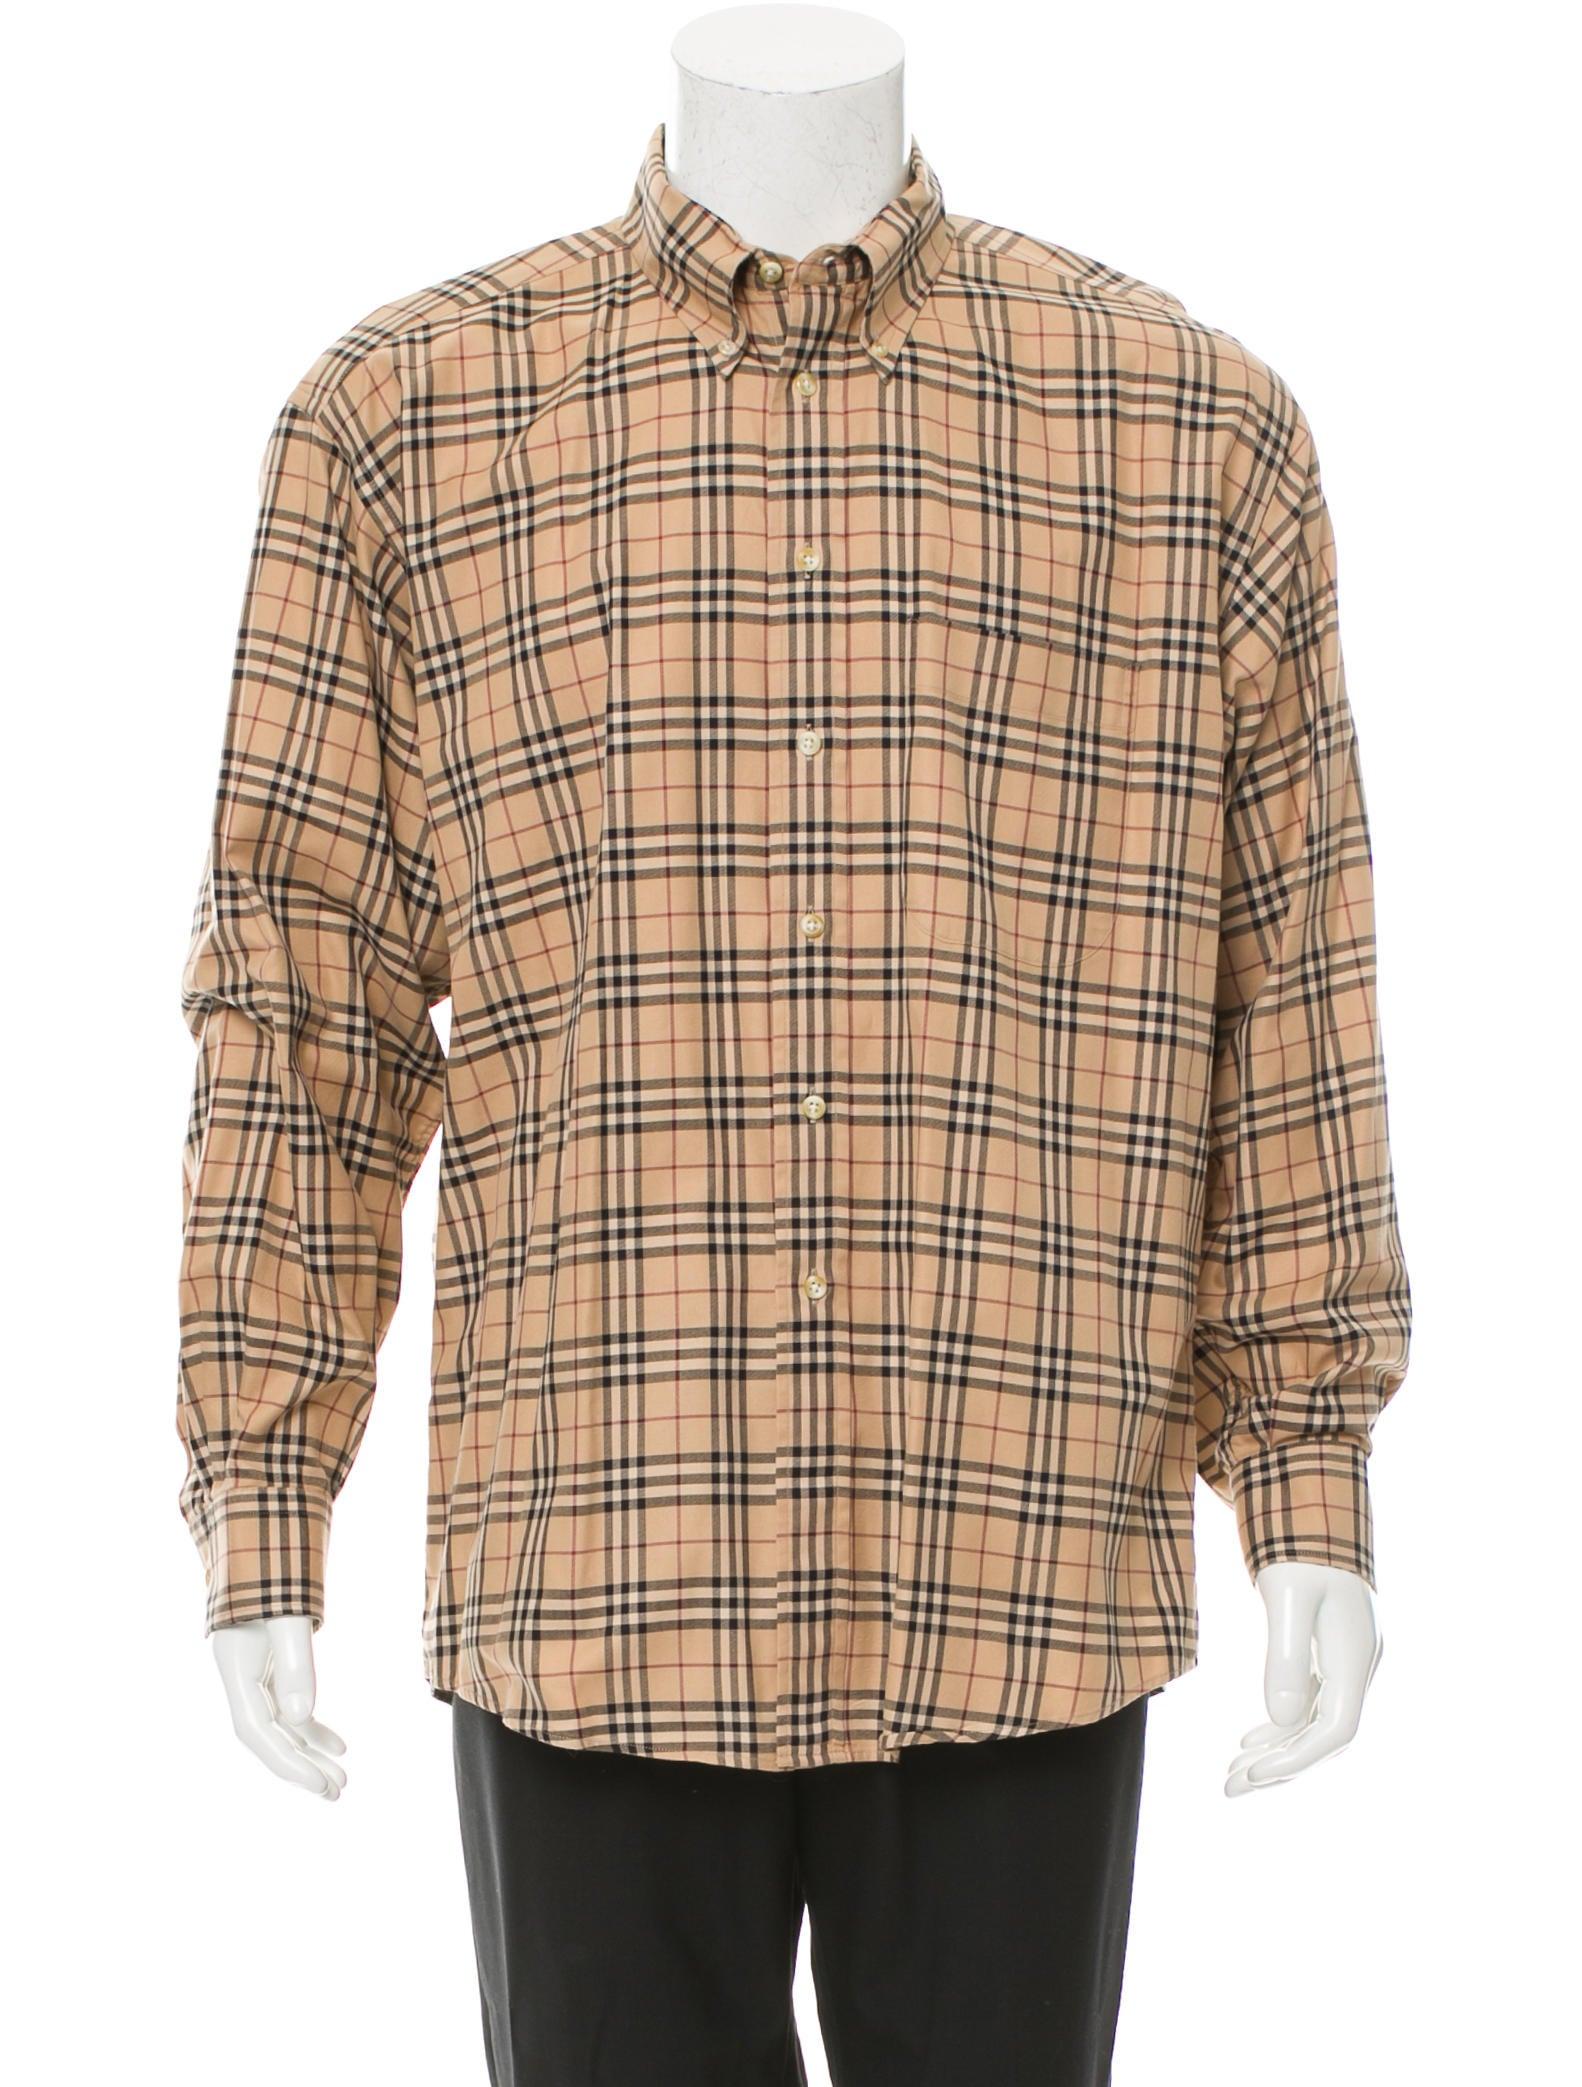 Burberry London Nova Check Shirt Clothing Wburl23050